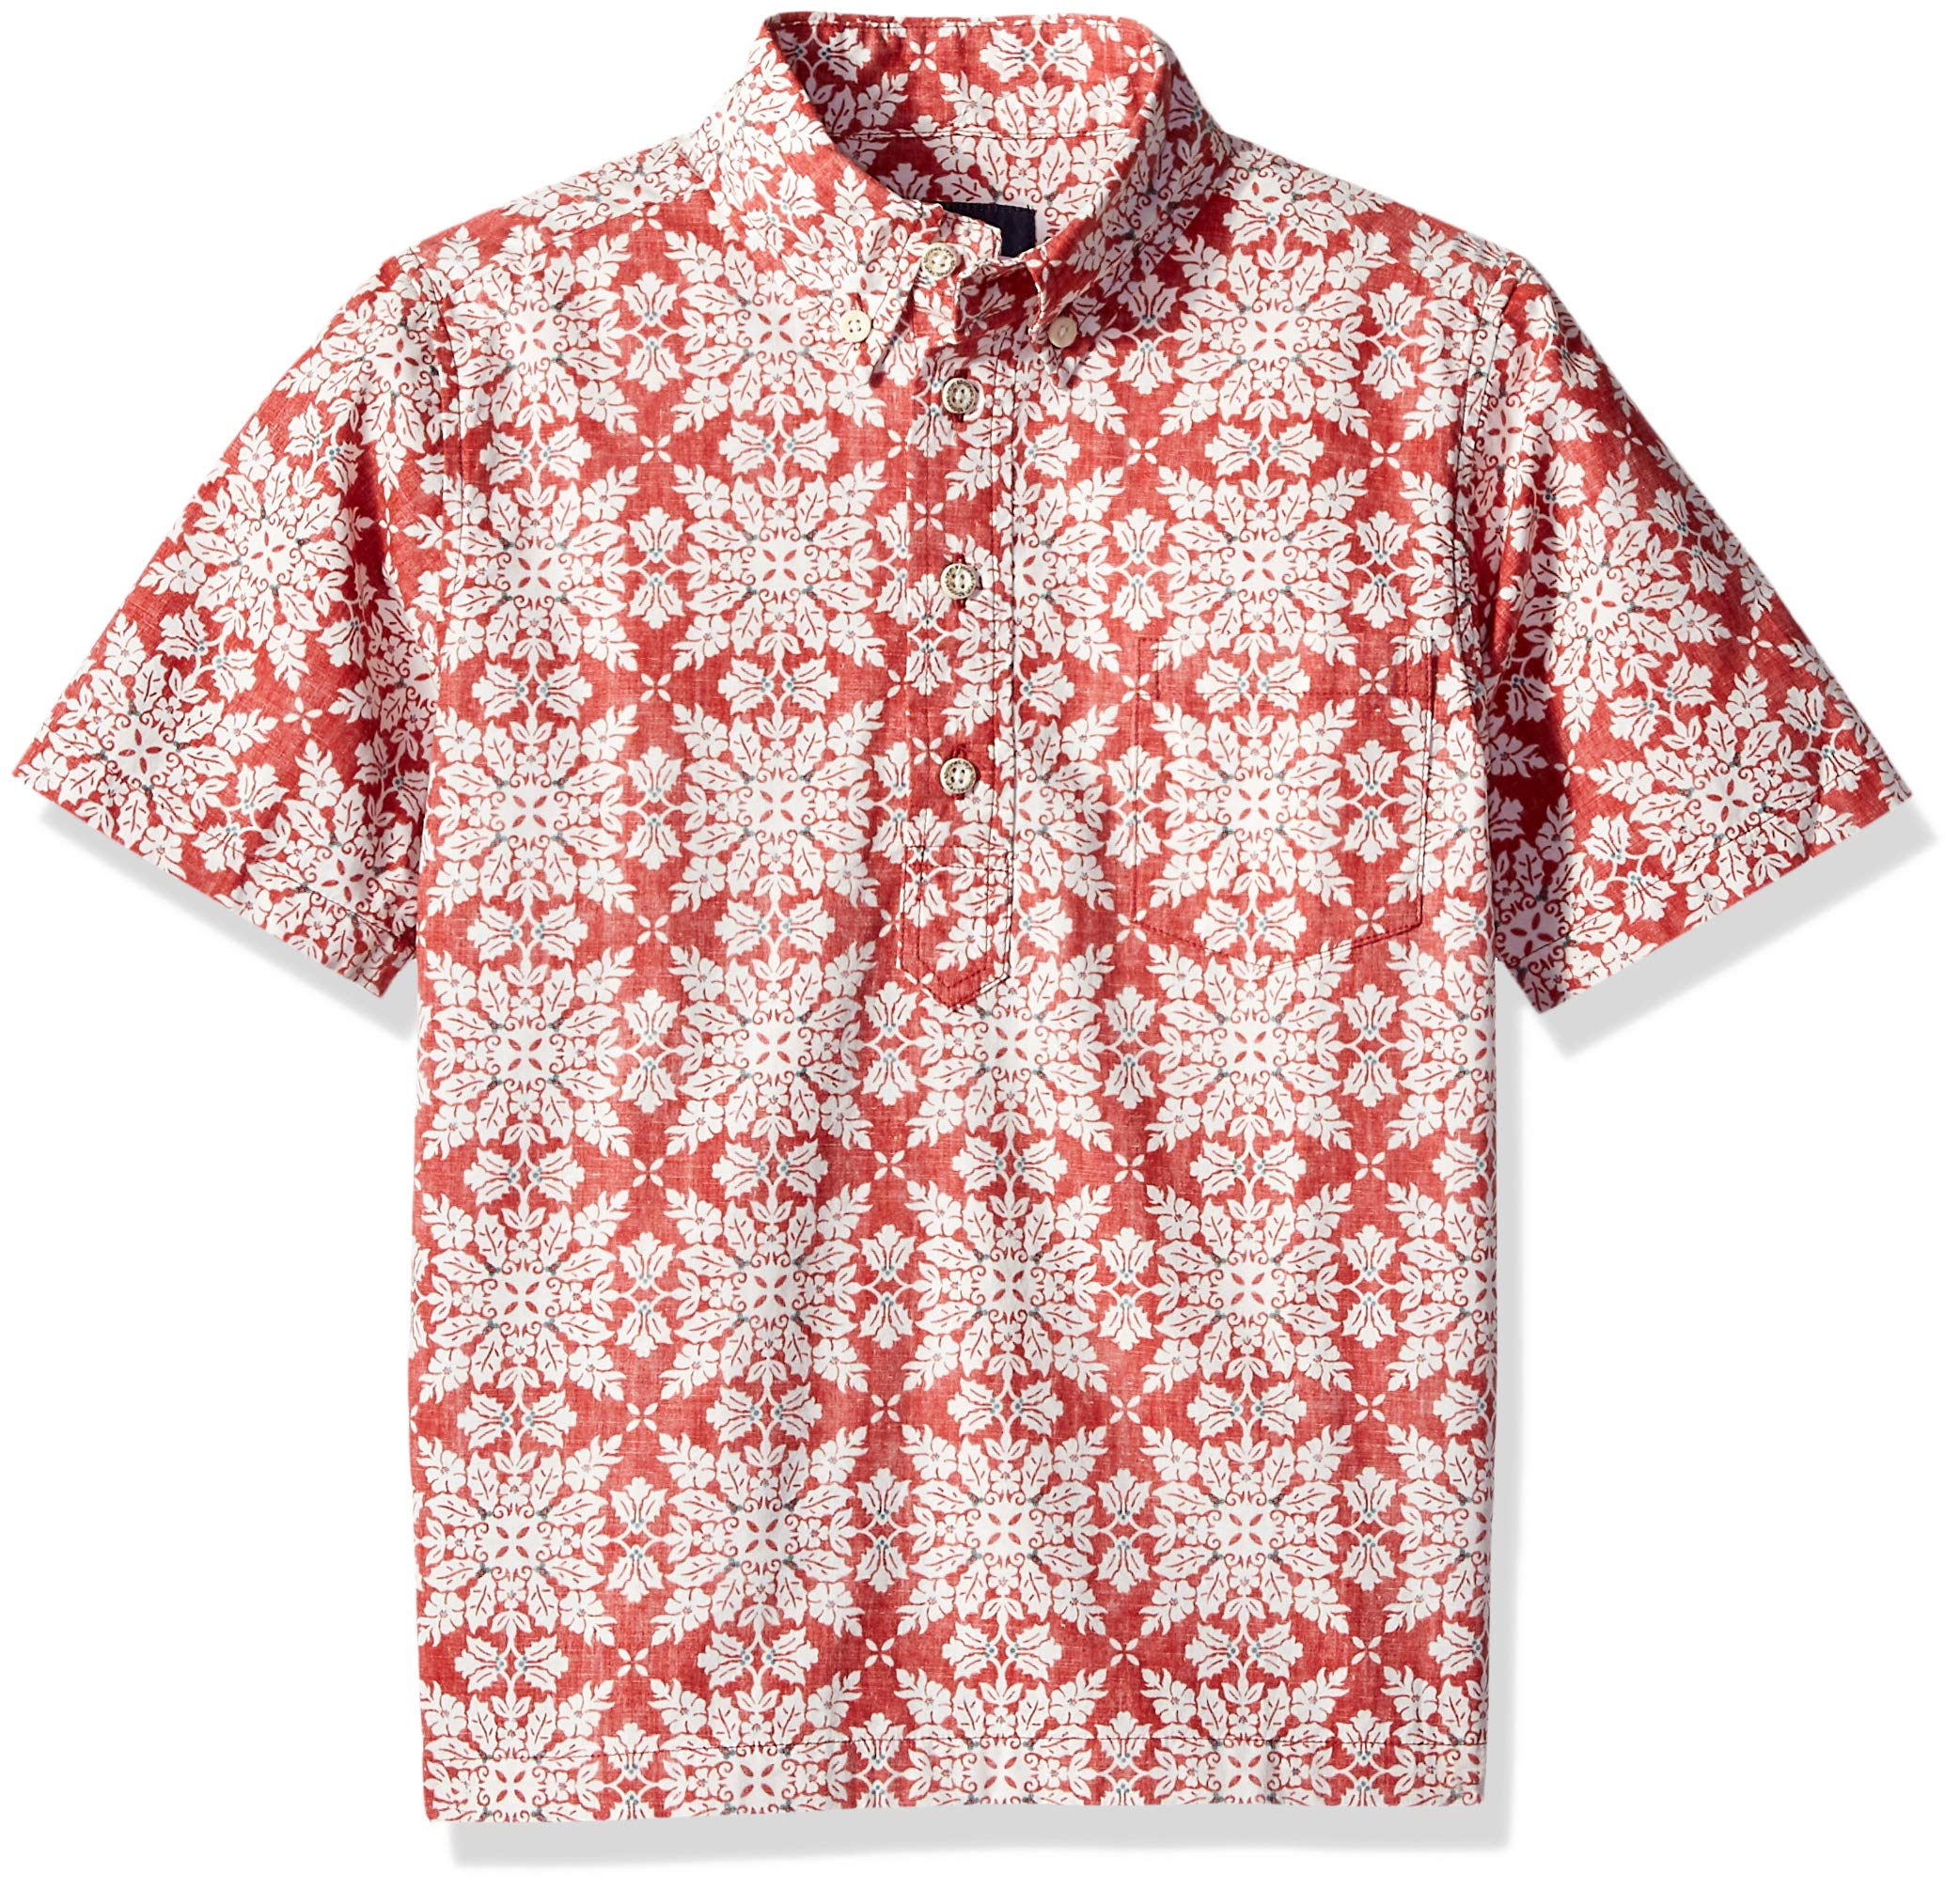 Reyn Spooner Boys' Big Christmas Quilt Pullover Shirt, Christmas Quilt - Red, S